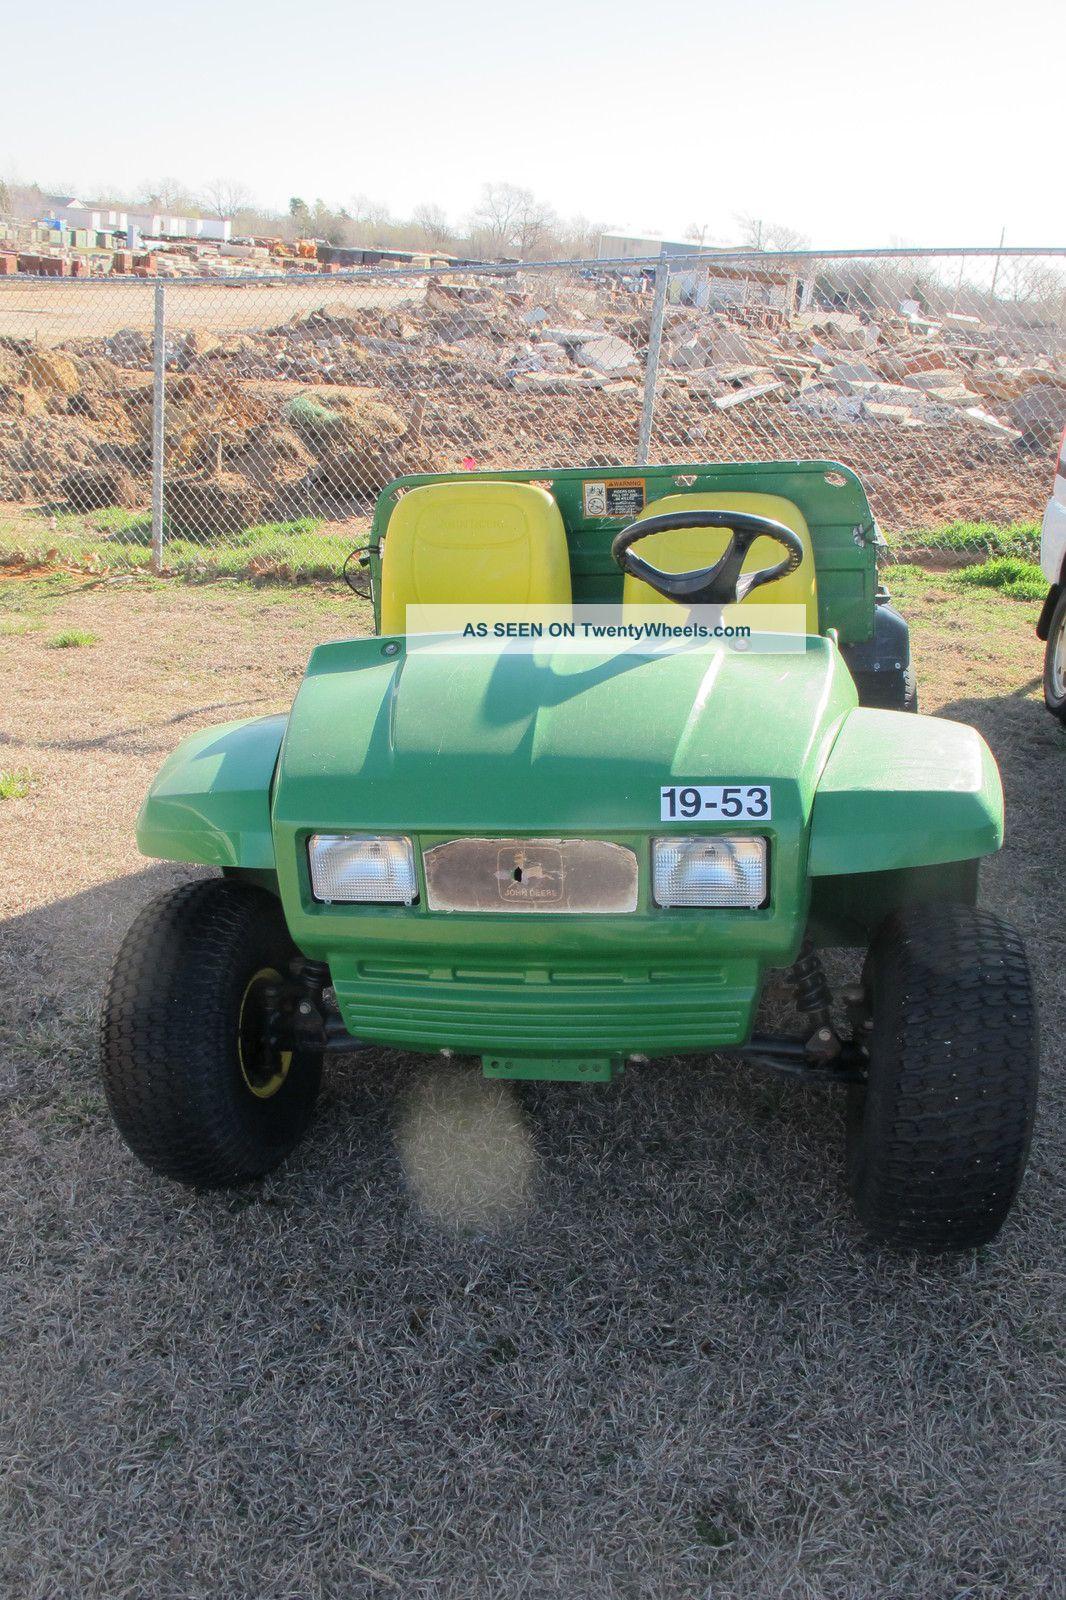 2003 John Deere Gator Utility Vehicles photo